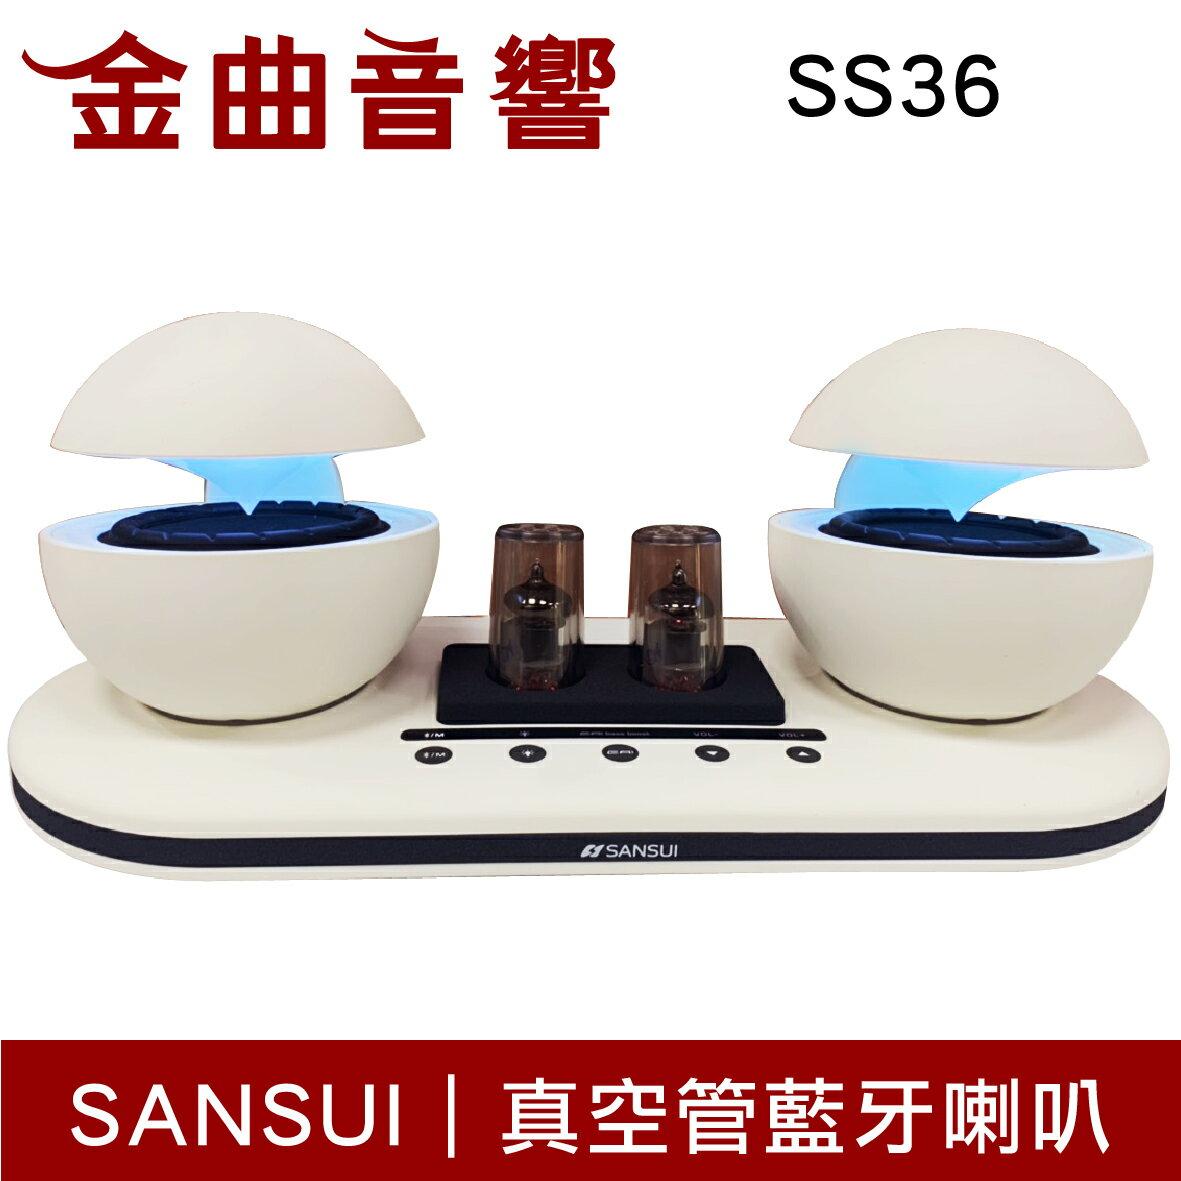 SANSUI SS36 真空管 藍牙 喇叭 | 金曲音響